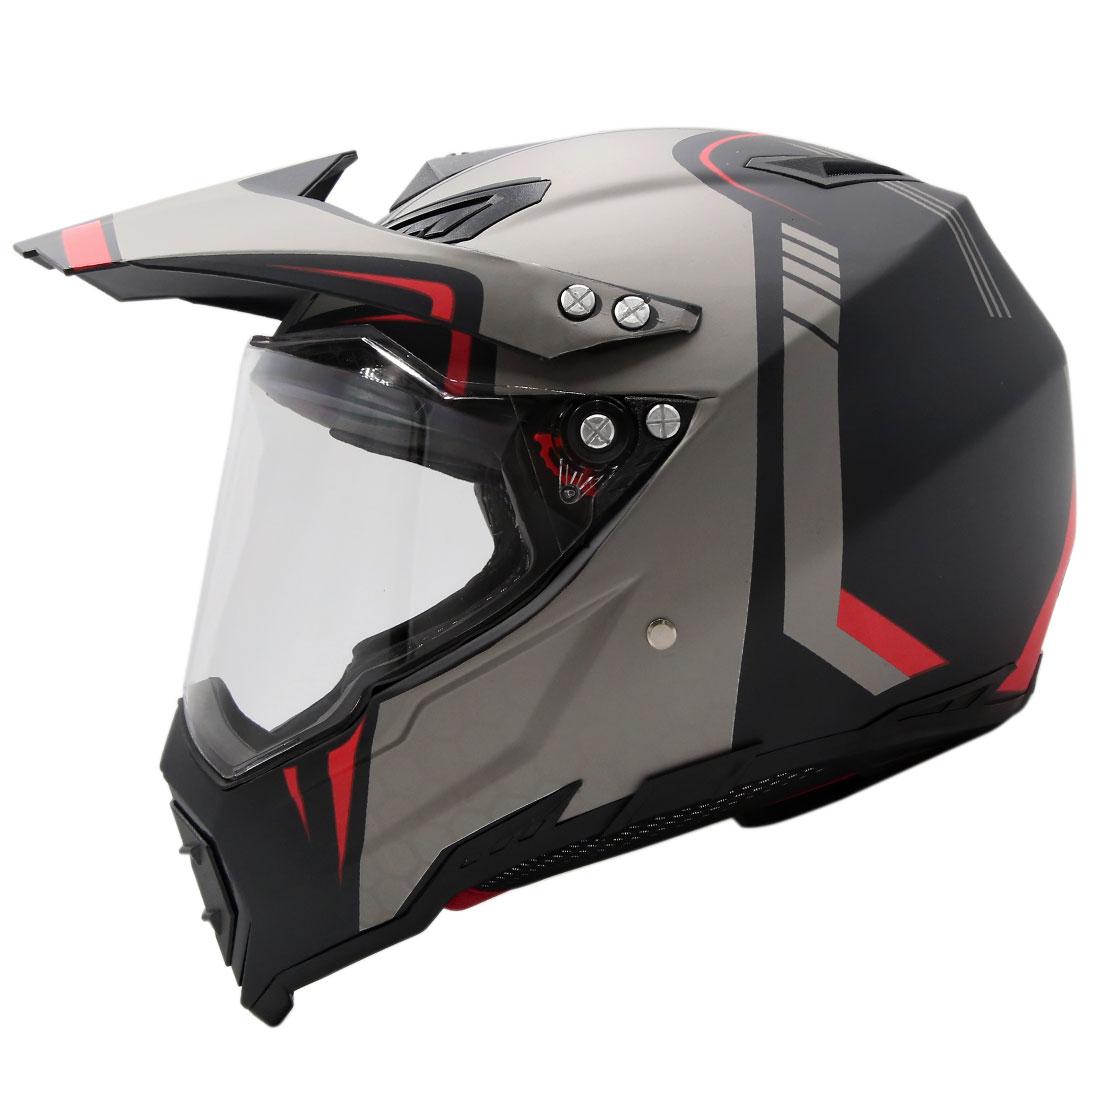 Unisex-Adult Dirtbike Off-Road ATV Motocross Motorcycle Helmet Flip Up Visor